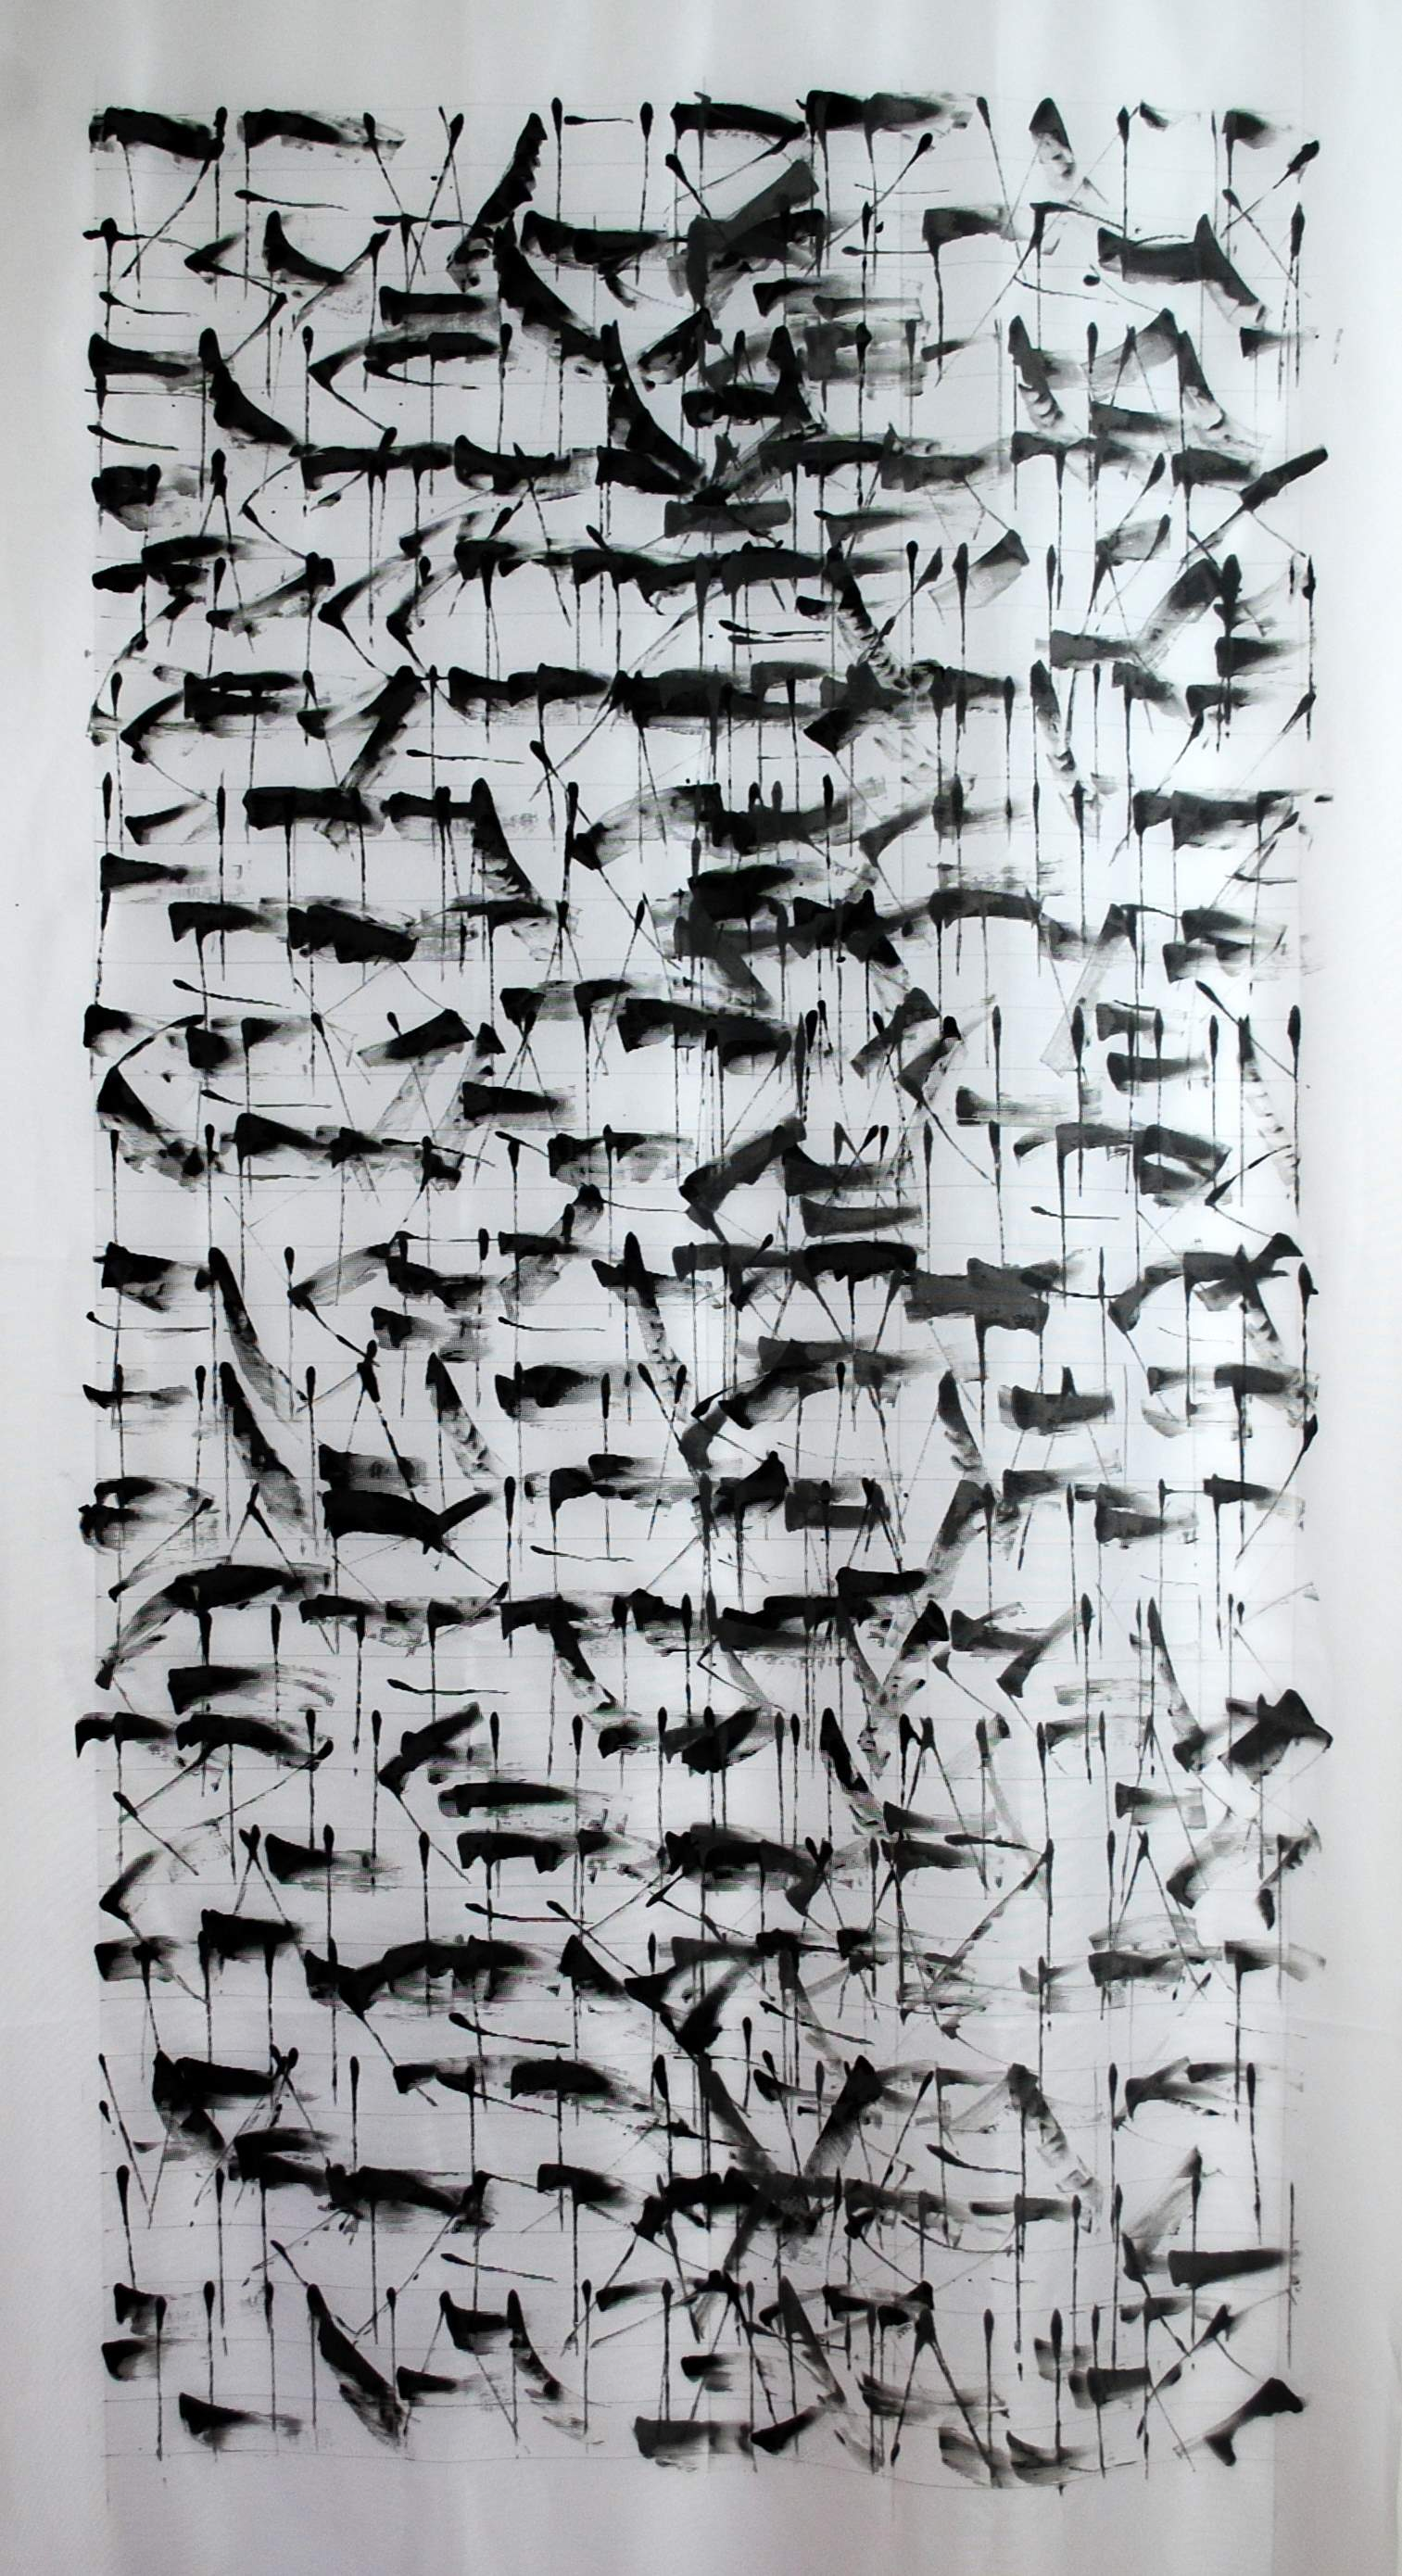 Kunst-Künstler-Bildhauer-Peter-Rappl-Artikel-I-01 (1)